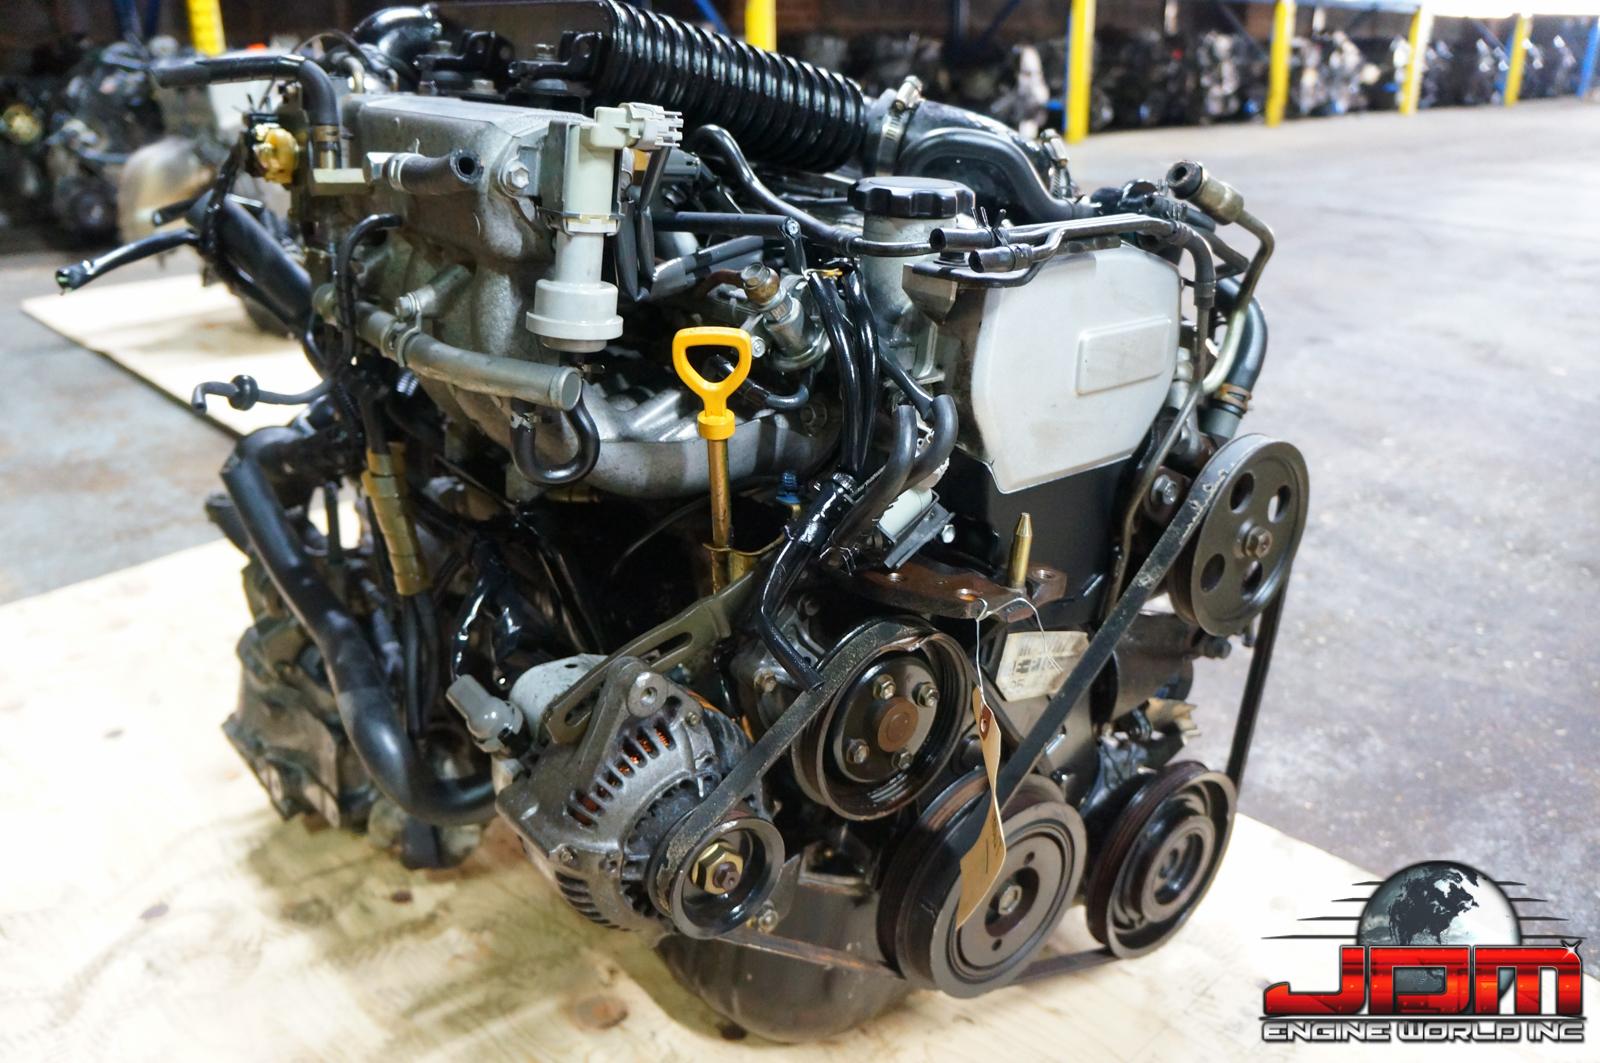 TOYOTA STARLET 4E-T 1.3L ENGINE WITH 5 SPEED TRANSMISSION JDM 4ET